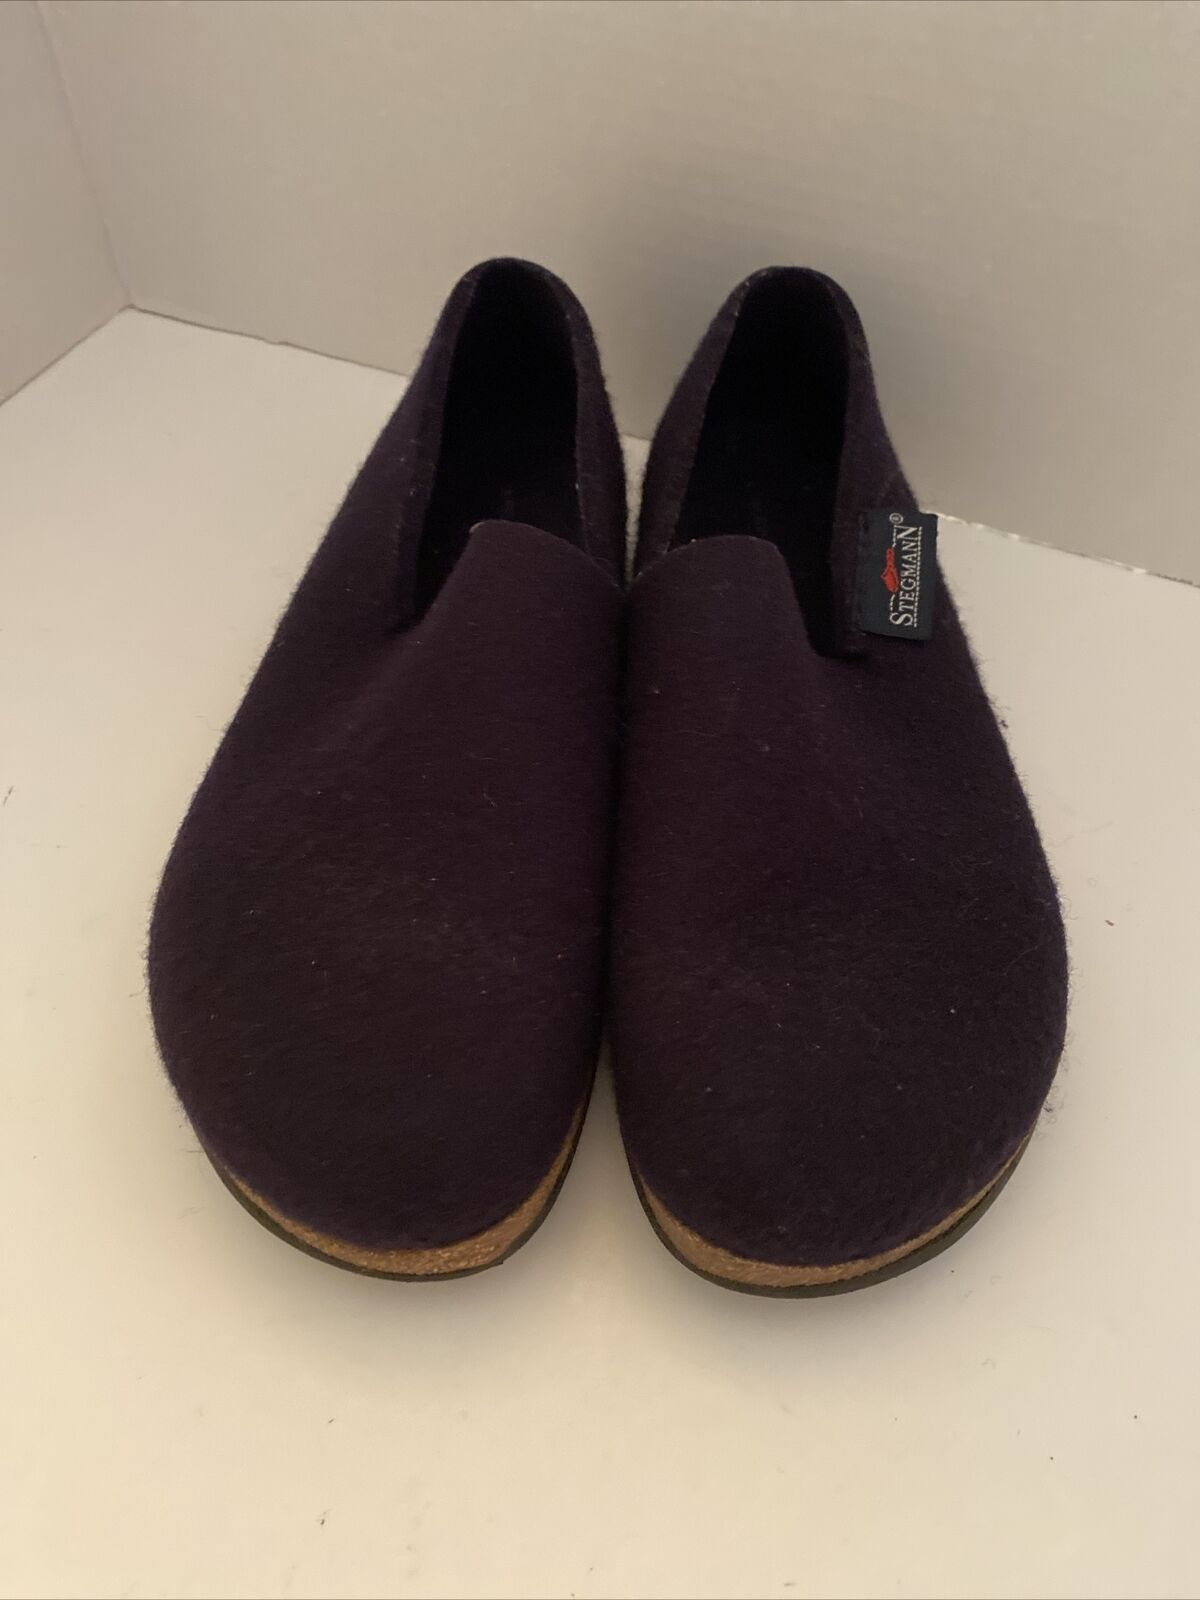 Womens STEGMAN Original 108 Wool Clog Shoe Cork Sole Blue Sz 7